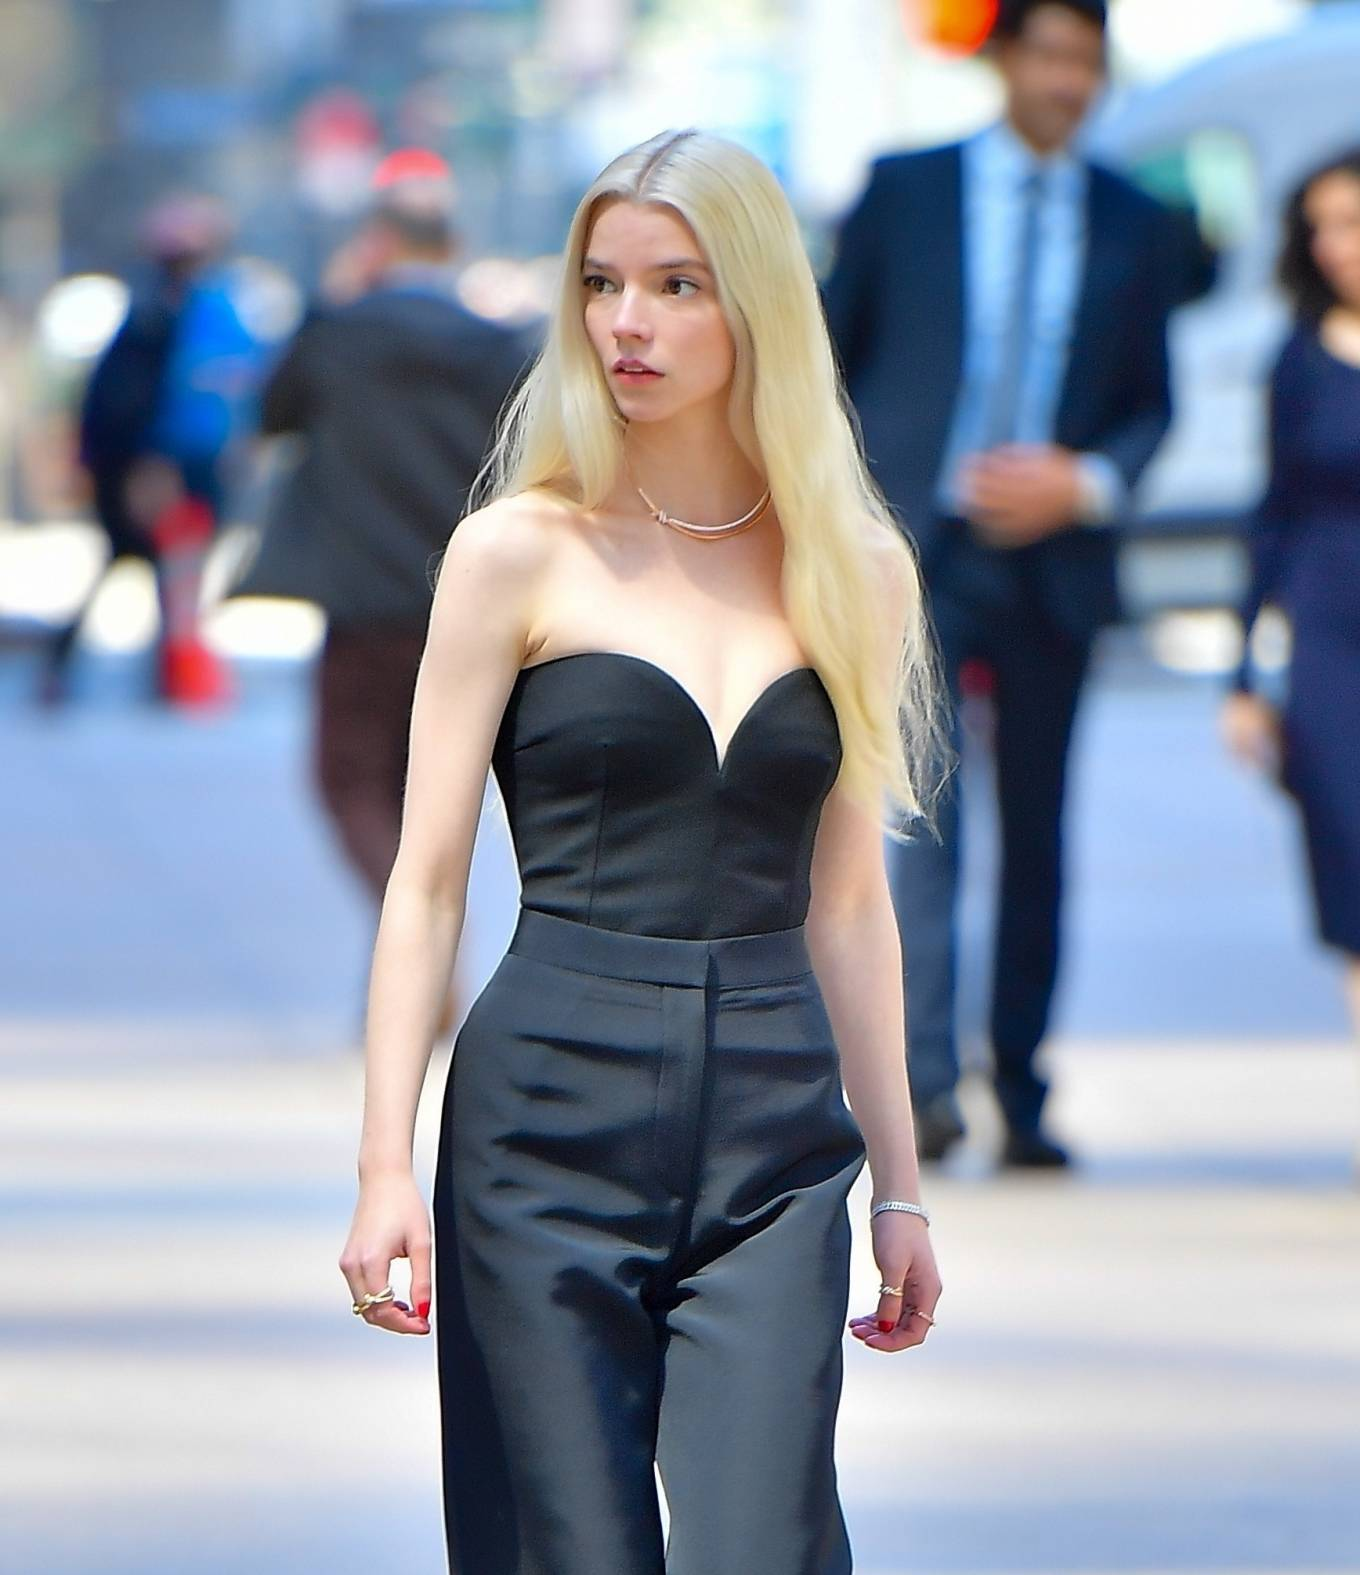 Anya Taylor-Joy 2021 : Anya Taylor-Joy – Shooting advert for Tiffany and Co in New York-12